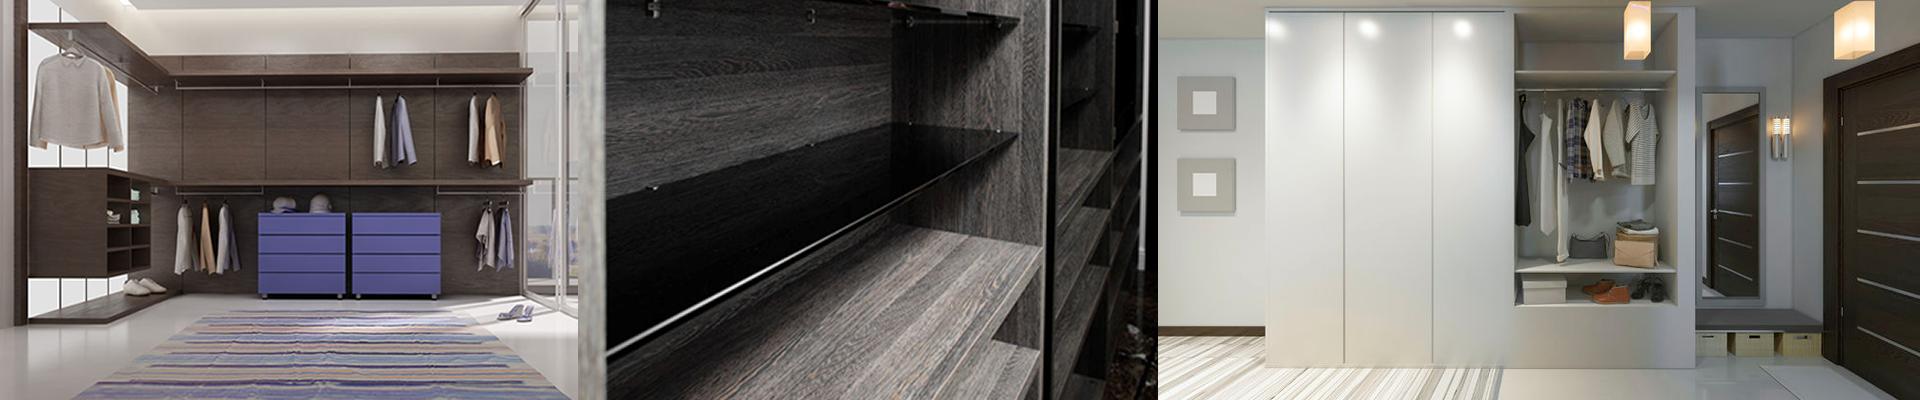 Wardrobes   Wooden, White, Mirrored, Sliding Wardrobe Doors & More